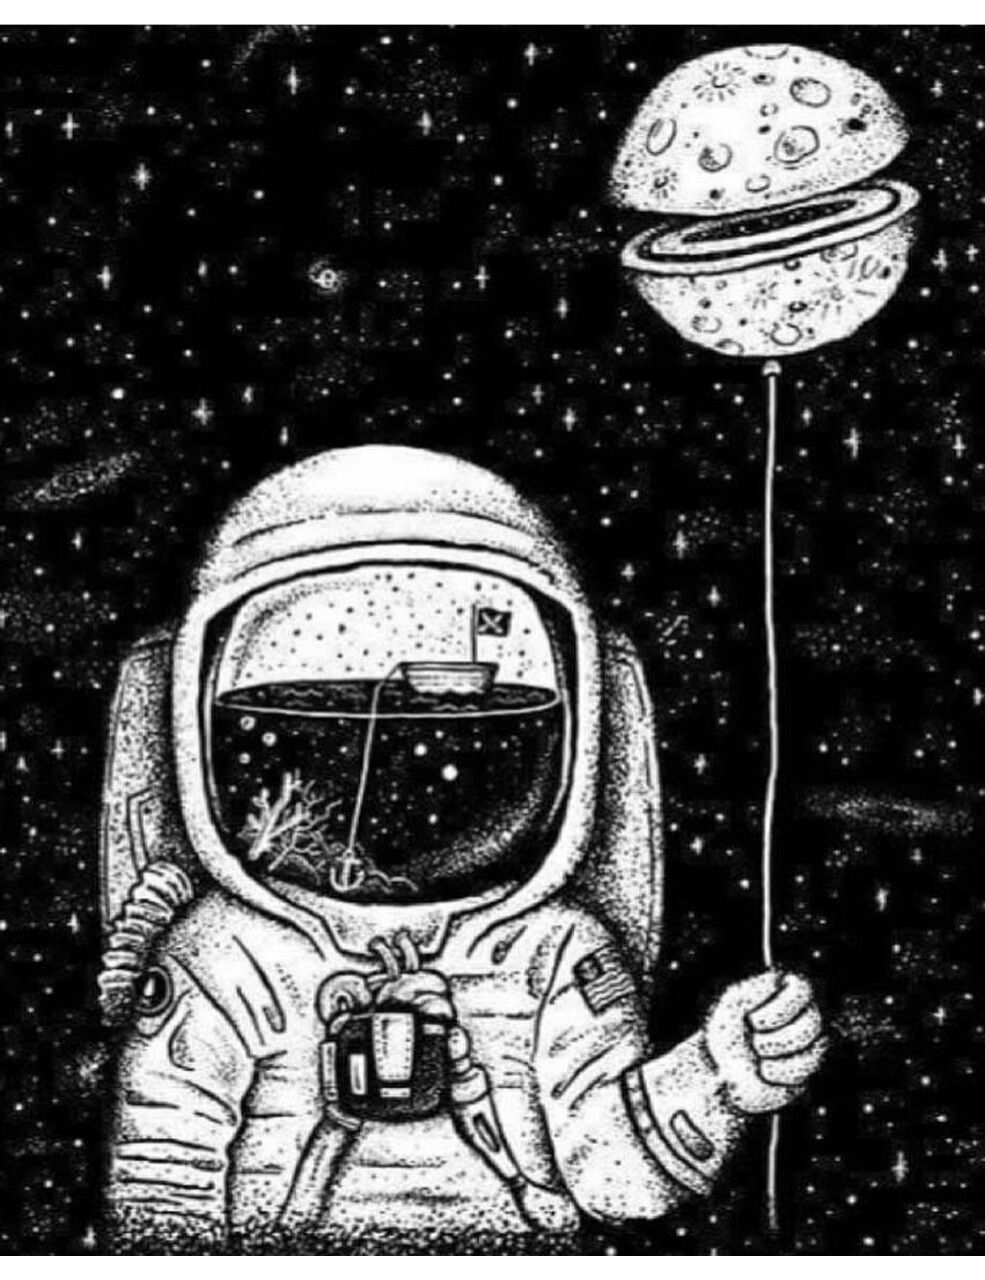 Cute Constellations Wallpaper